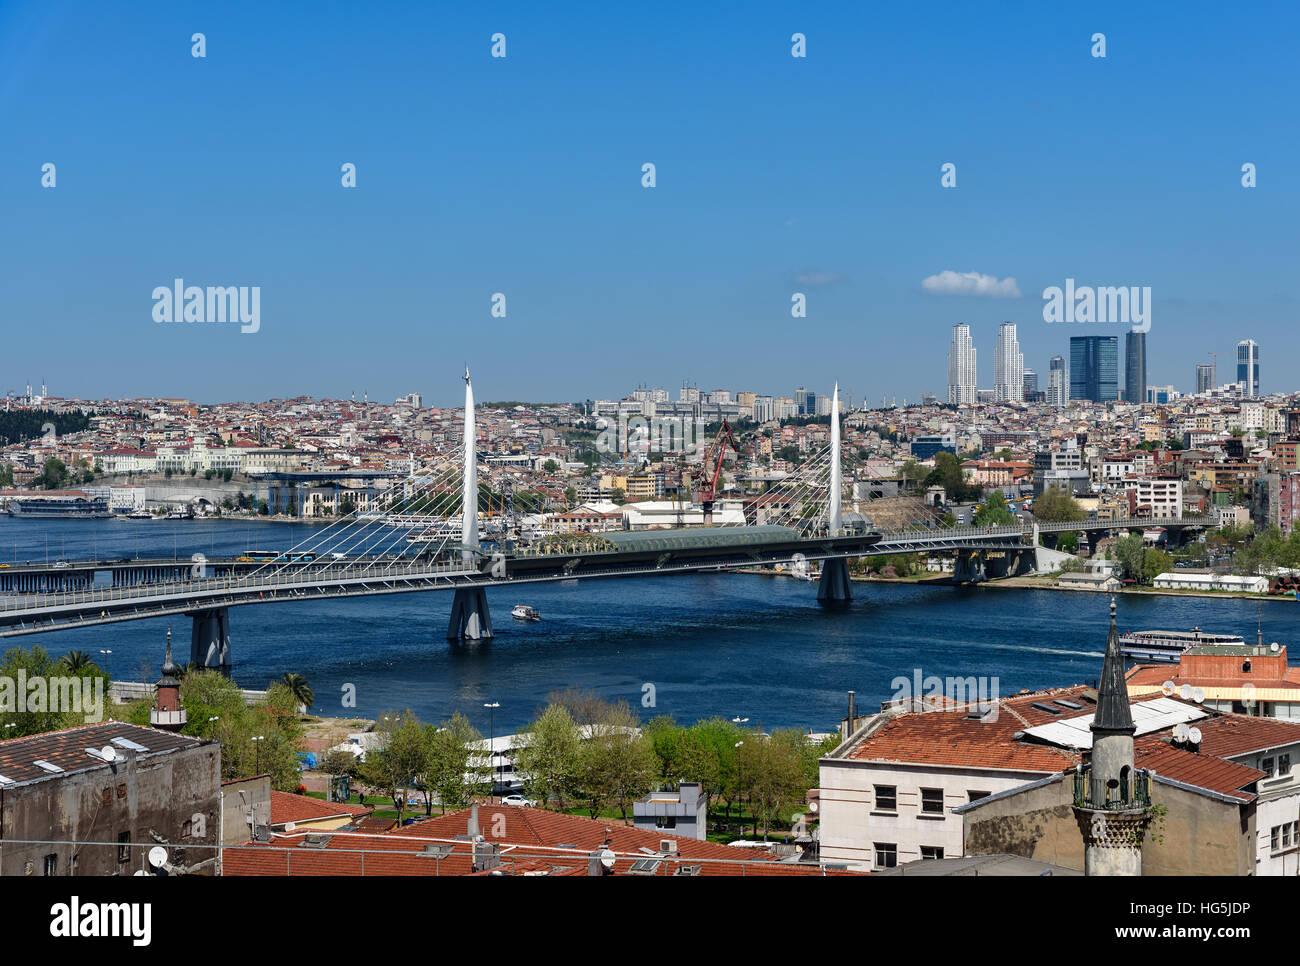 bridge of the golden horn pdf